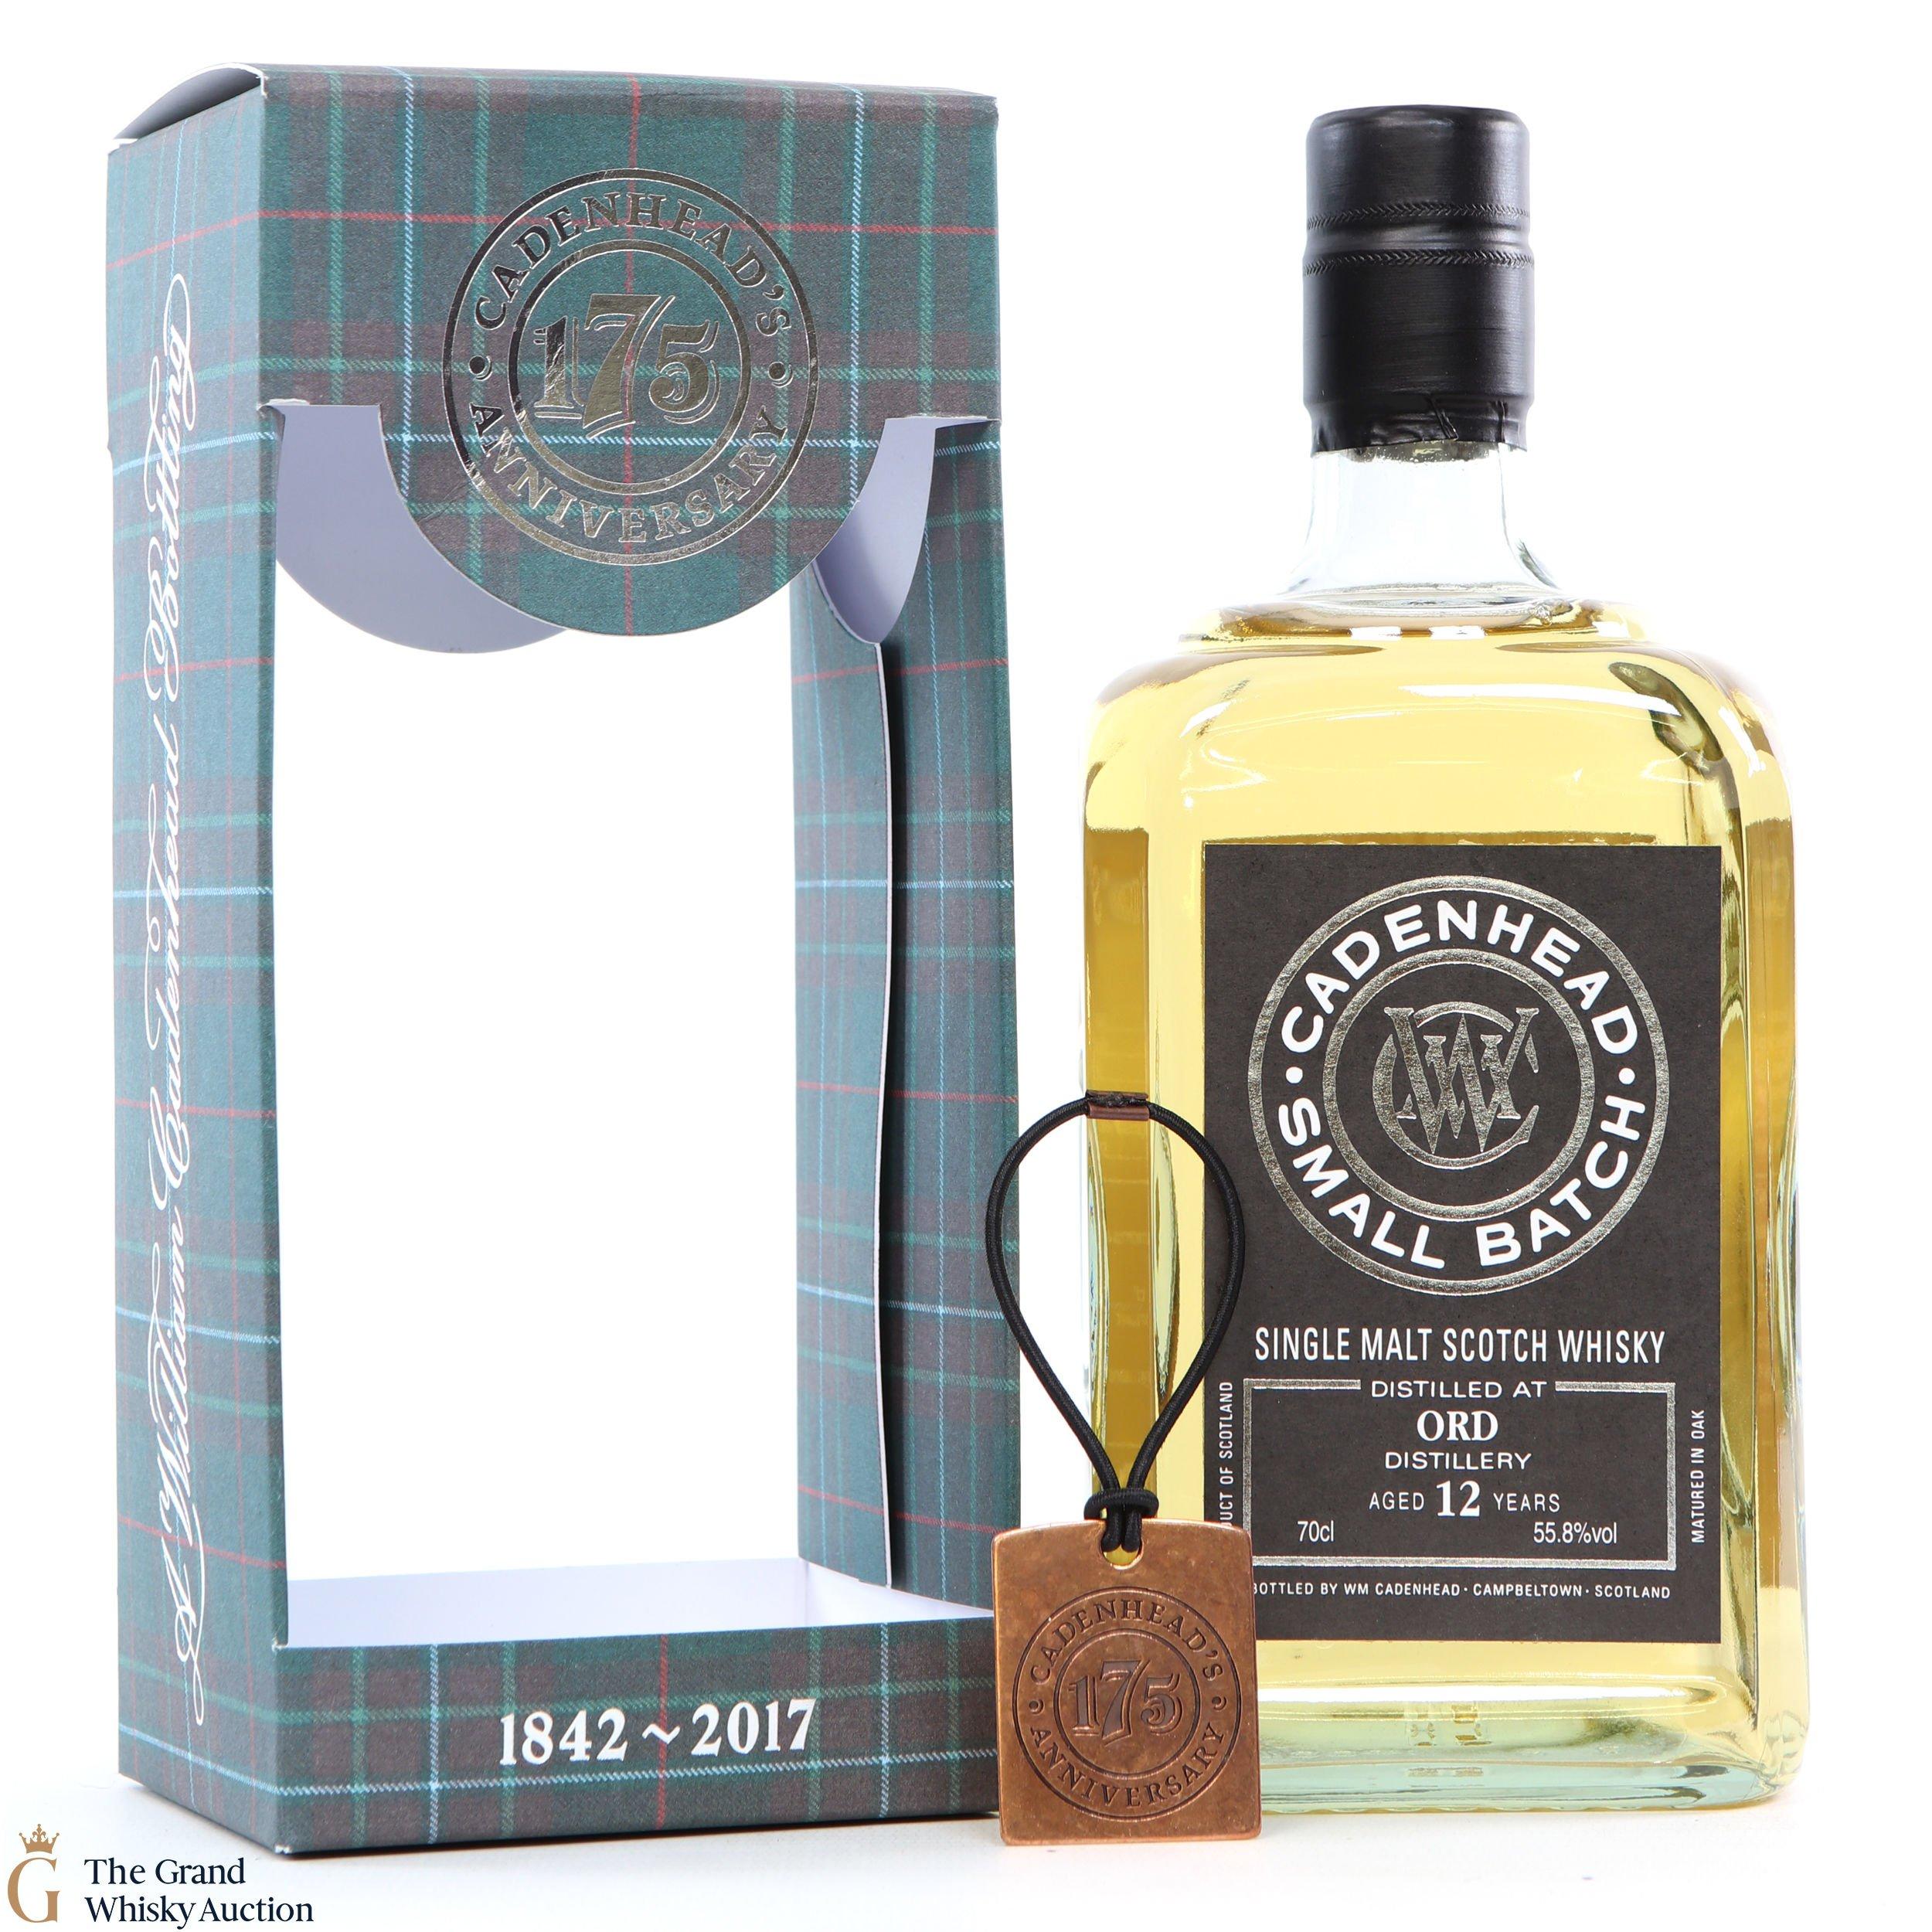 Eindejaars Whisky-loterij! Win een fles Cadenhead Small Batch – ORD Distillery 12y